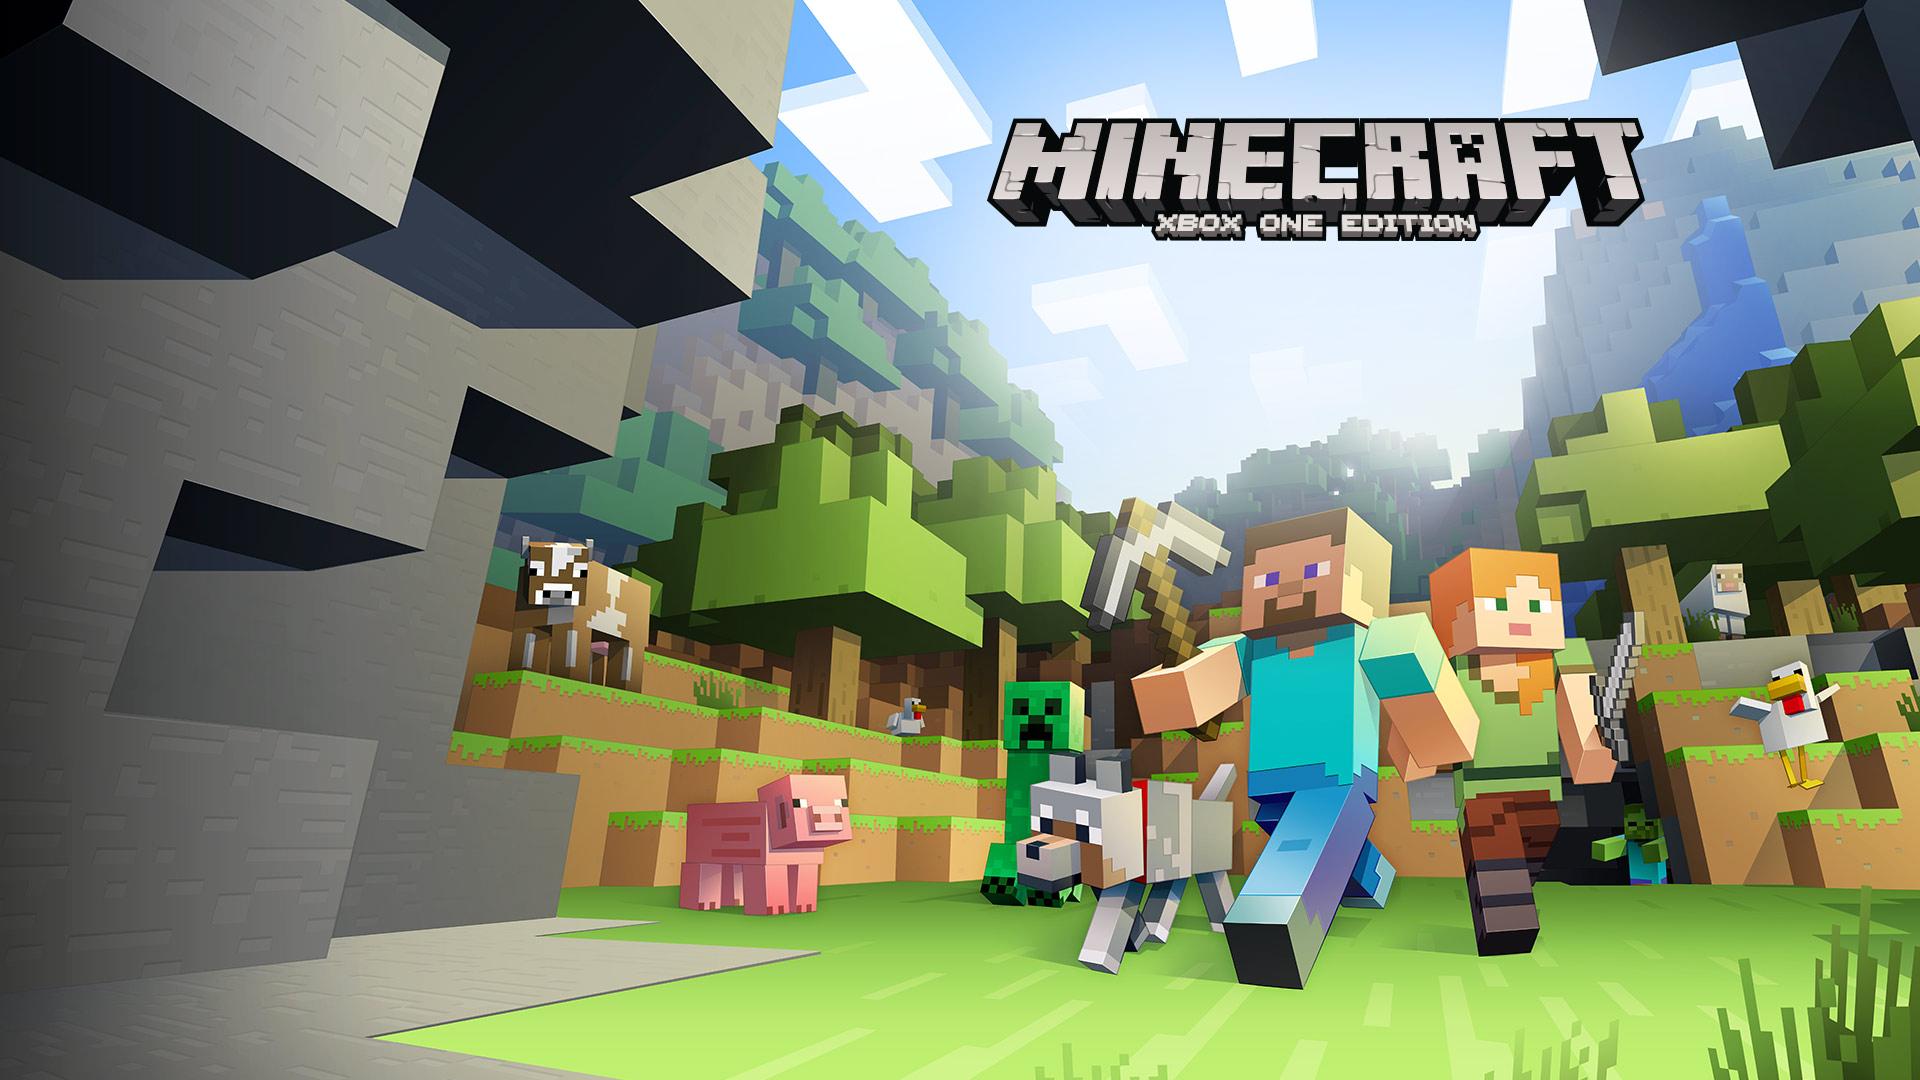 Minecraft hero